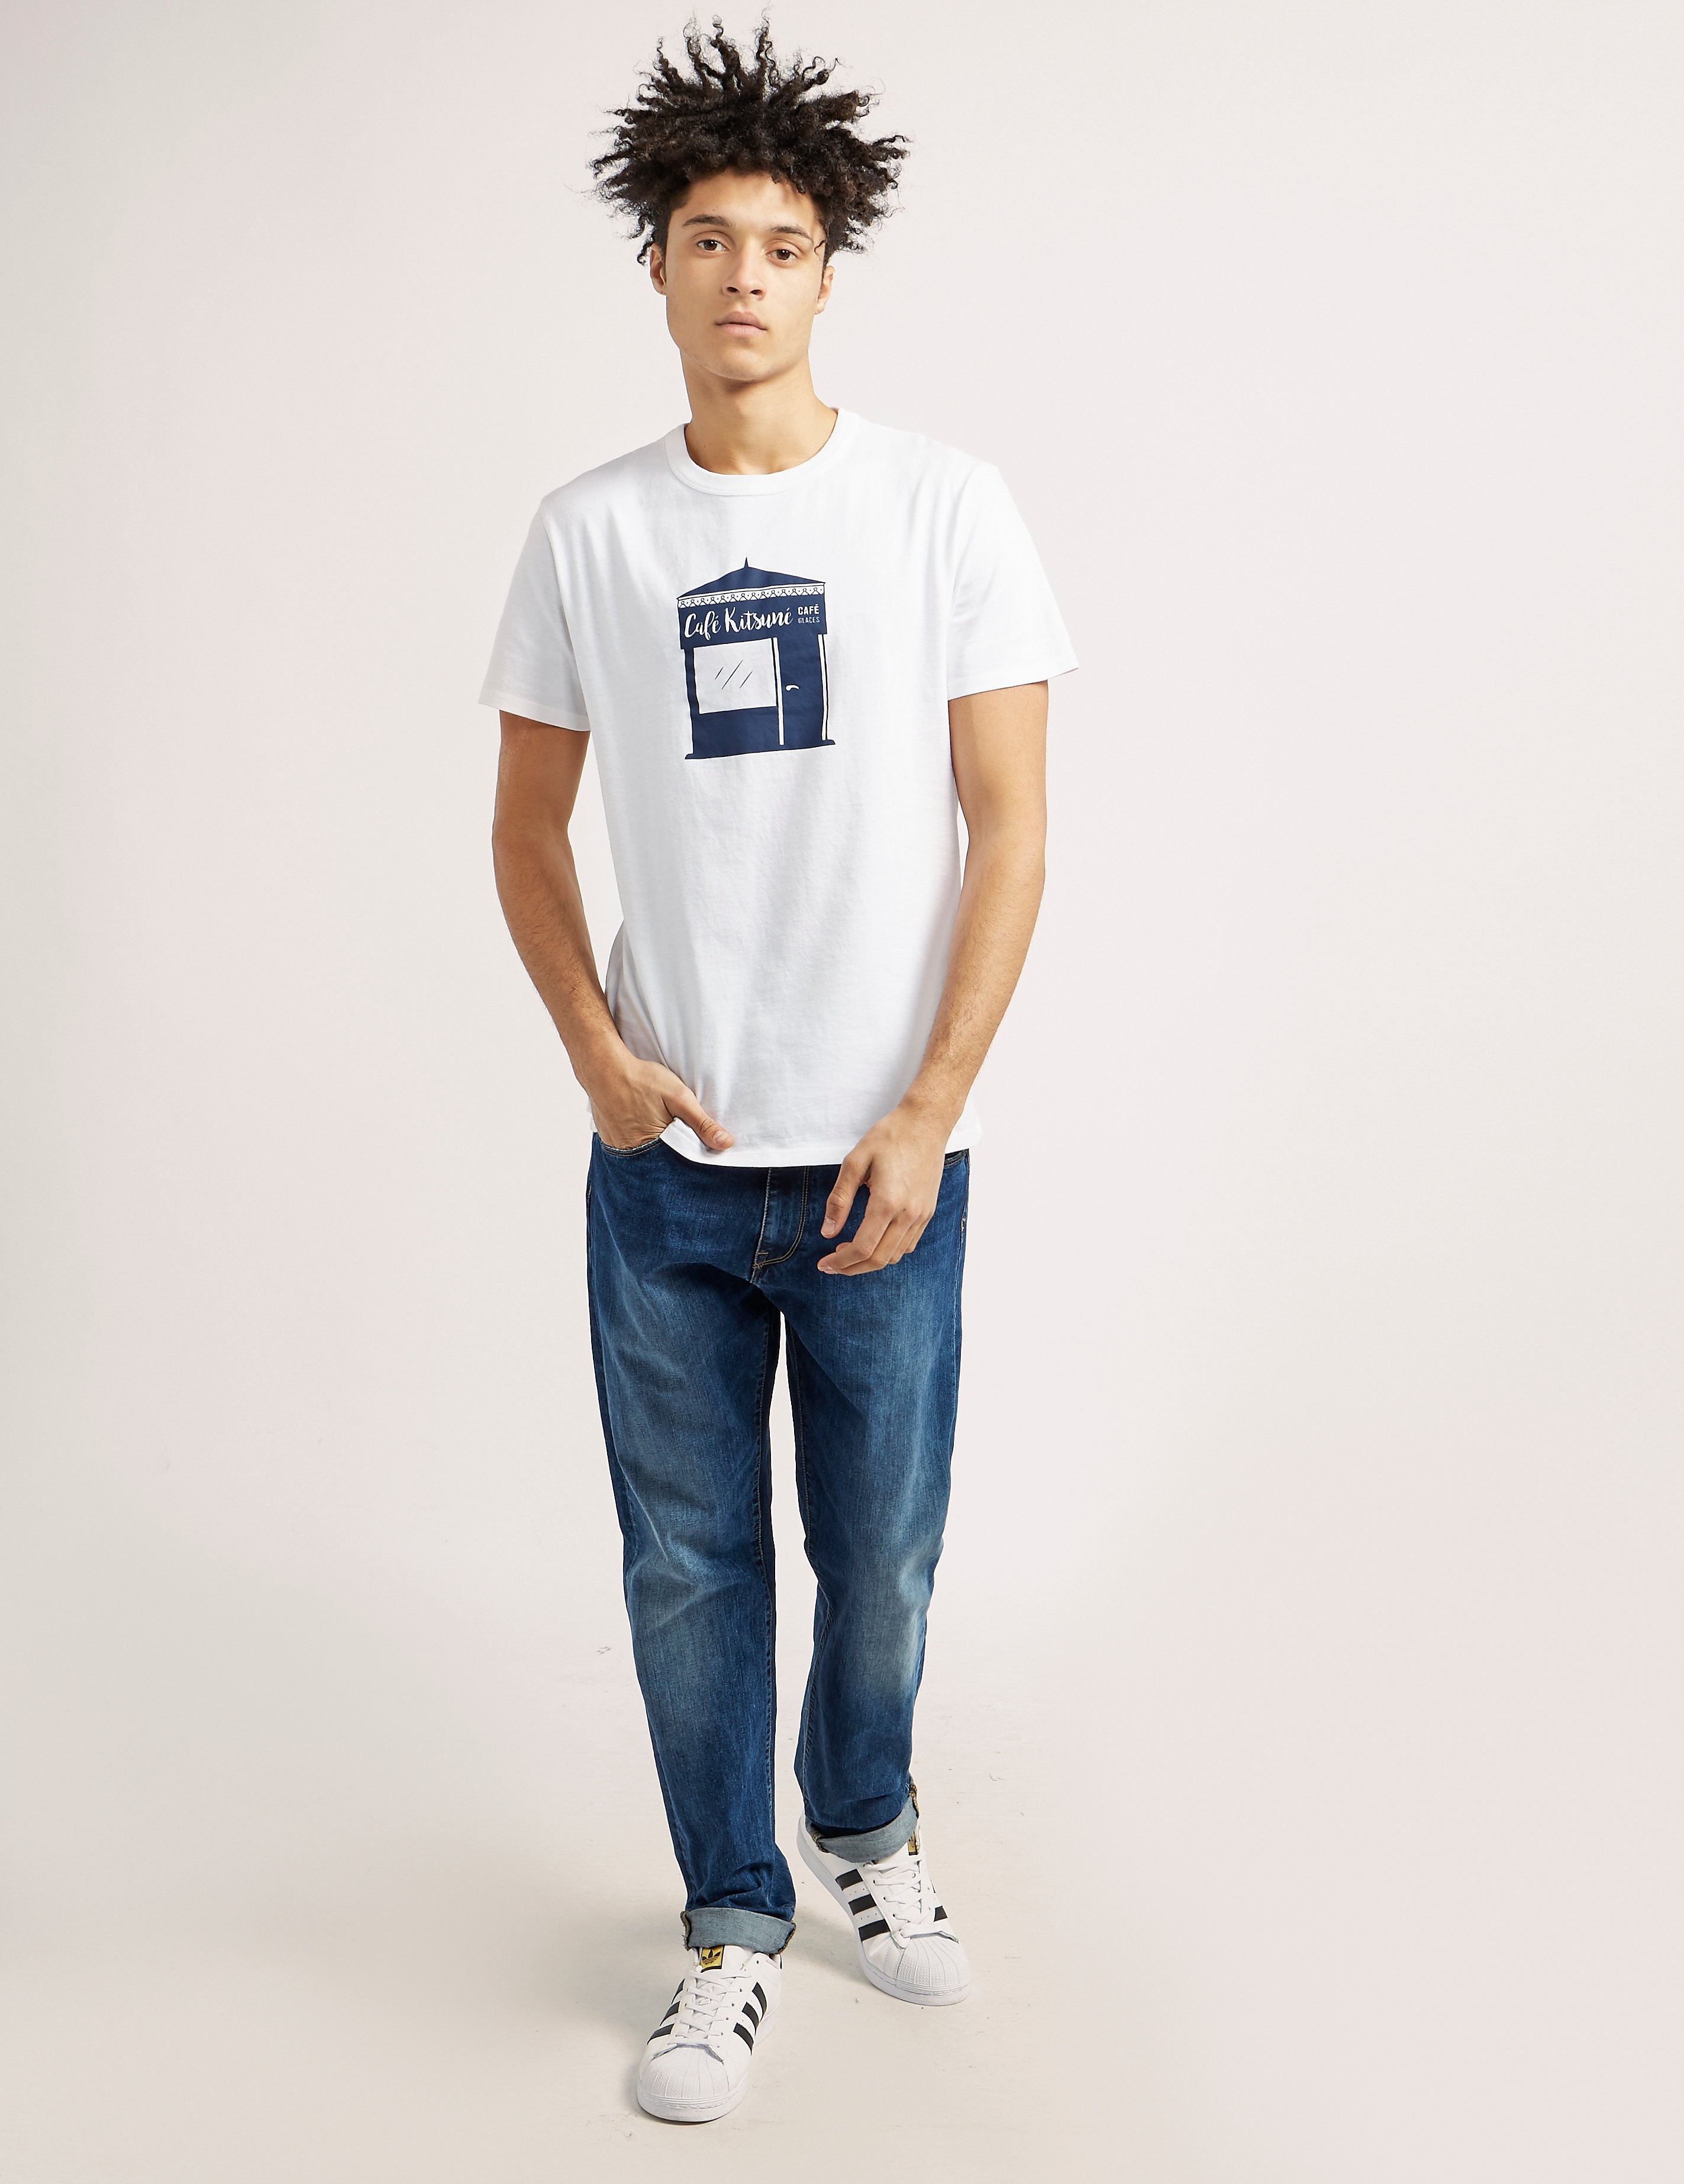 Maison Kitsune Kiosk Short Sleeve T-Shirt